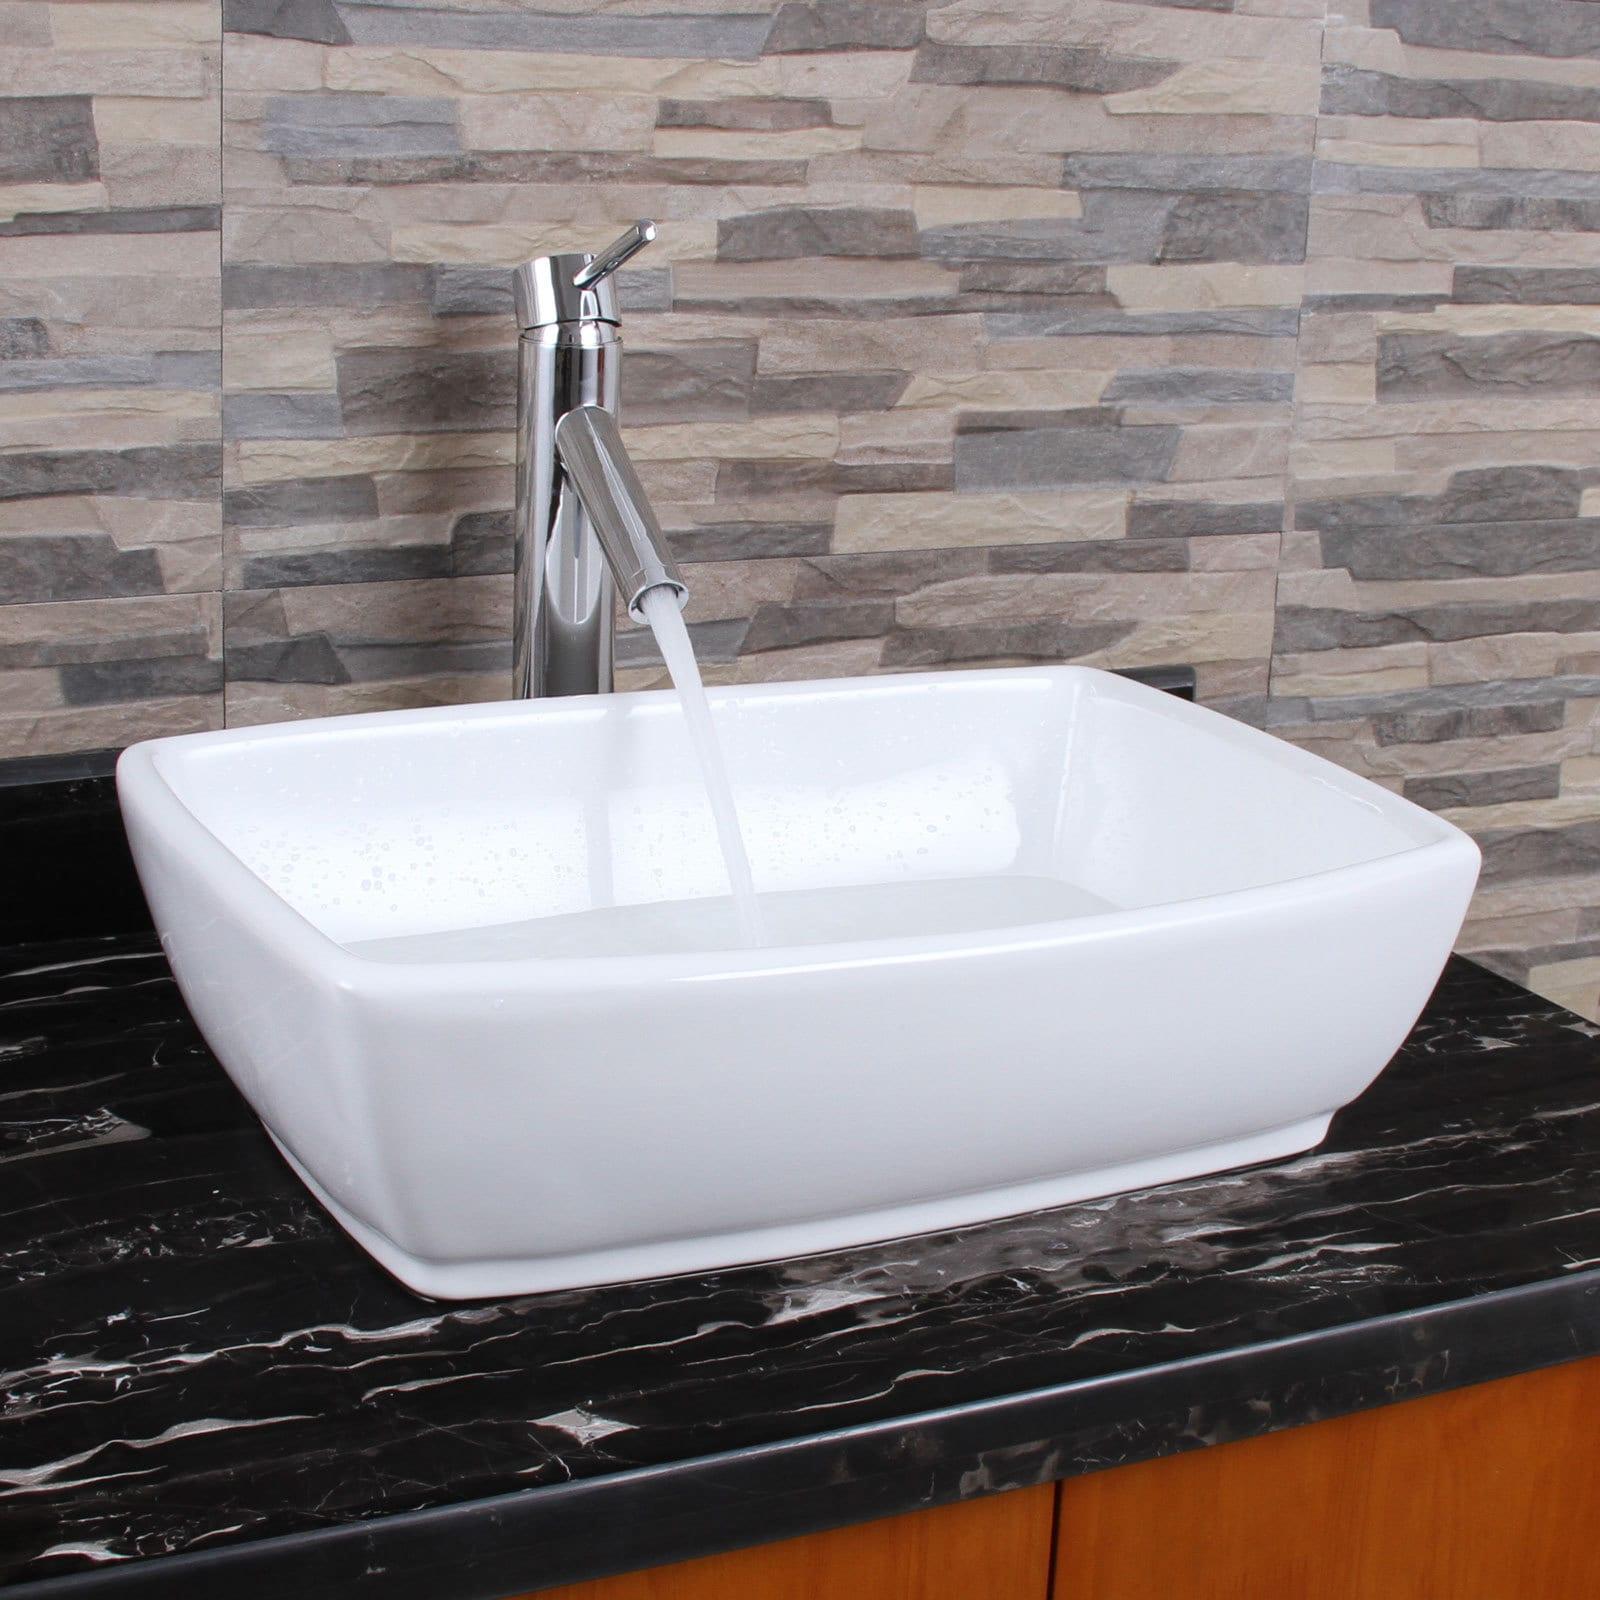 bathroom vessel sinks. elimax\u0027s unique rectangle shape white porcelain bathroom vessel sink with faucet combo (3 options available sinks t